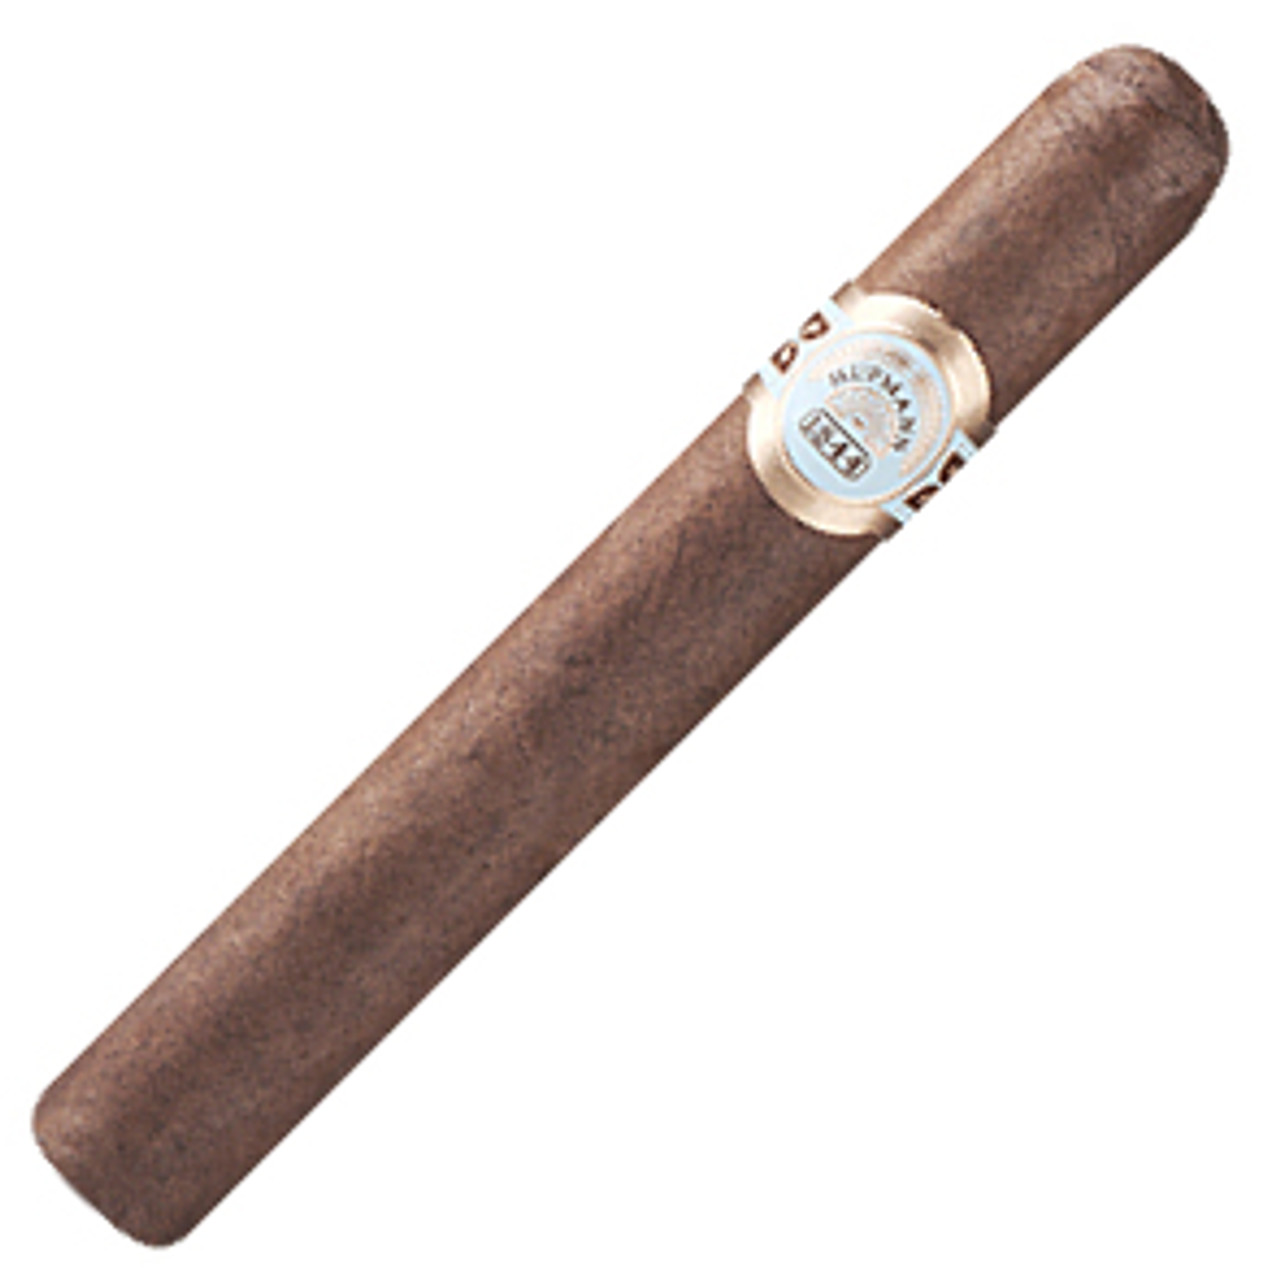 H. Upmann Original Petit Corona Cigars - 5 x 44 (Box of 25)